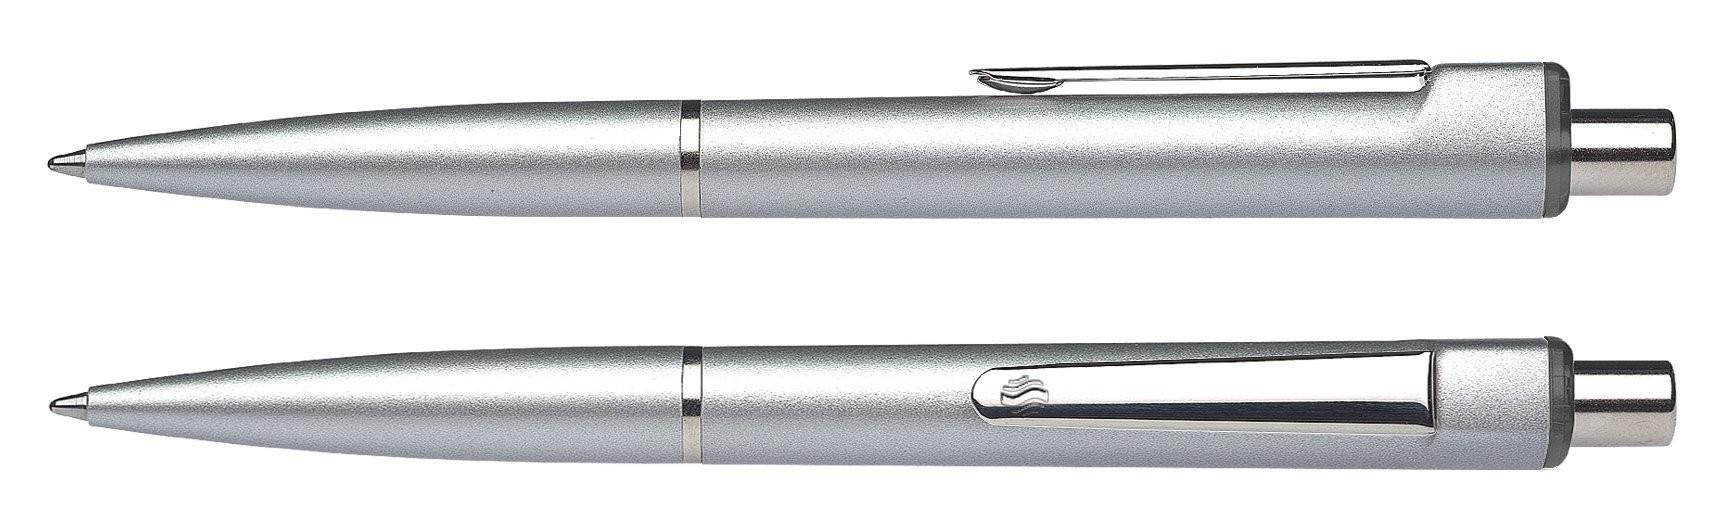 Kugelschreiber K 1 Metal